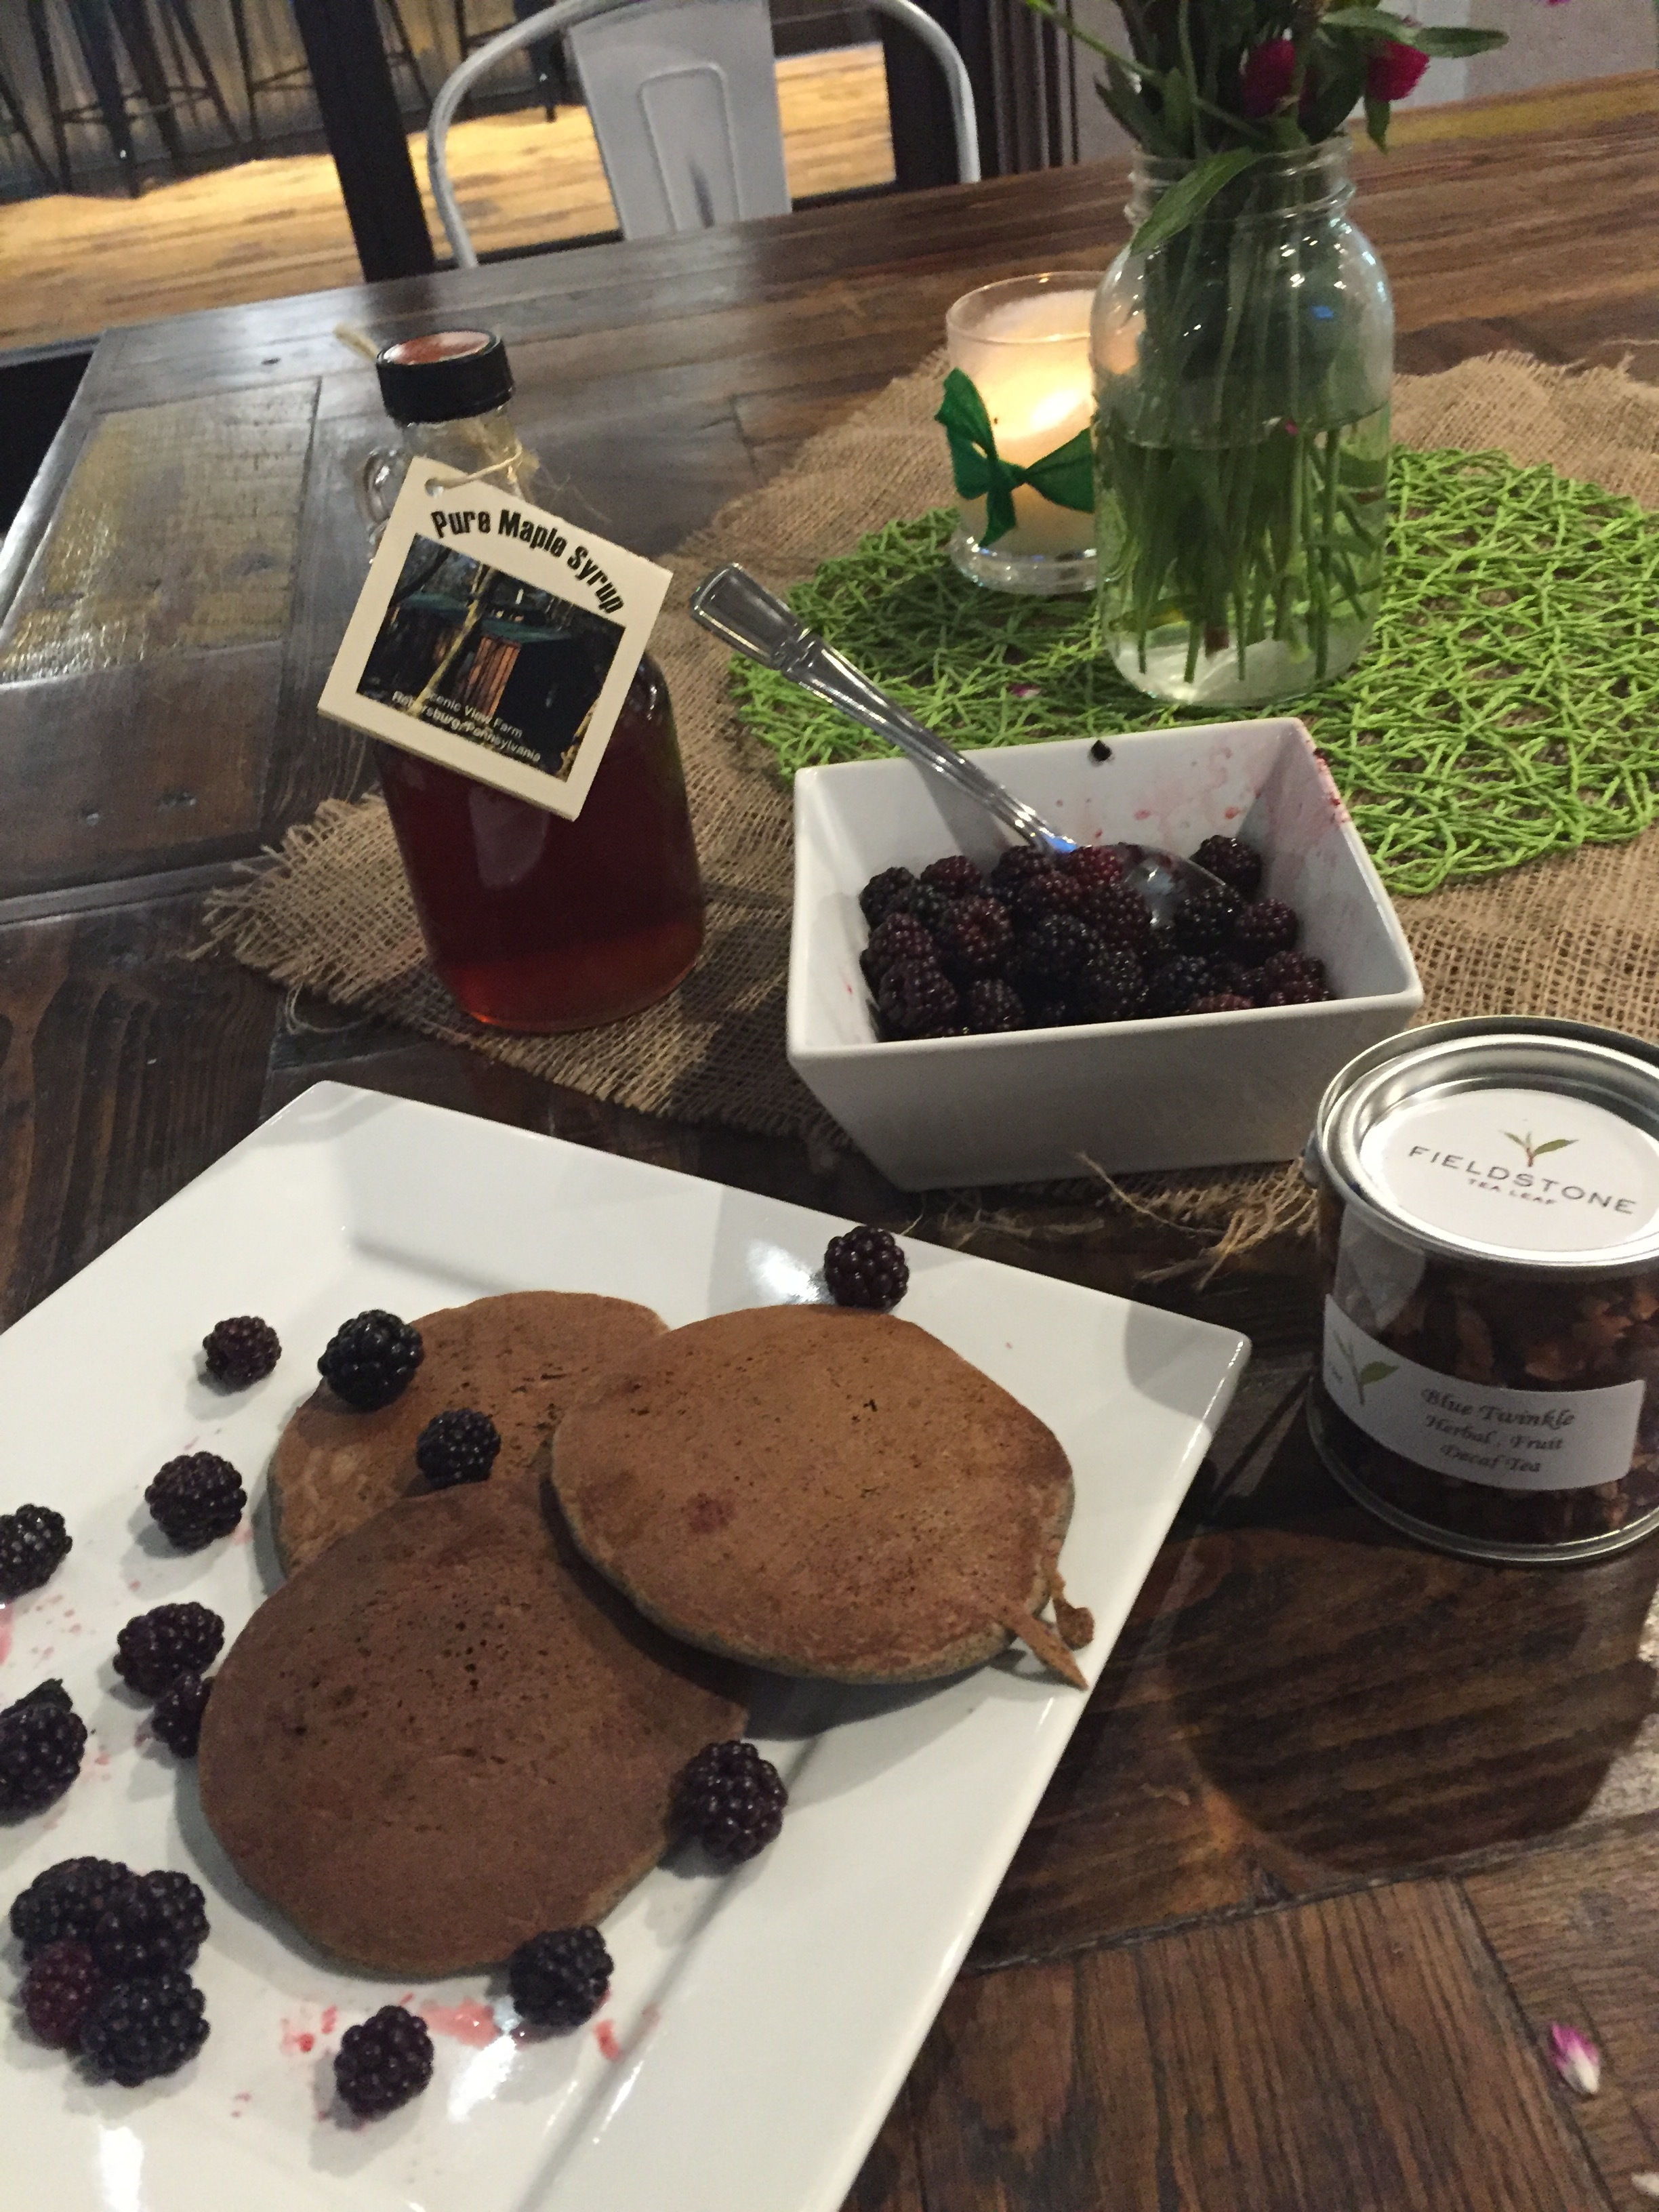 Buckwheat flaxseed pancakes with blackberries. Om to Yum, baby!